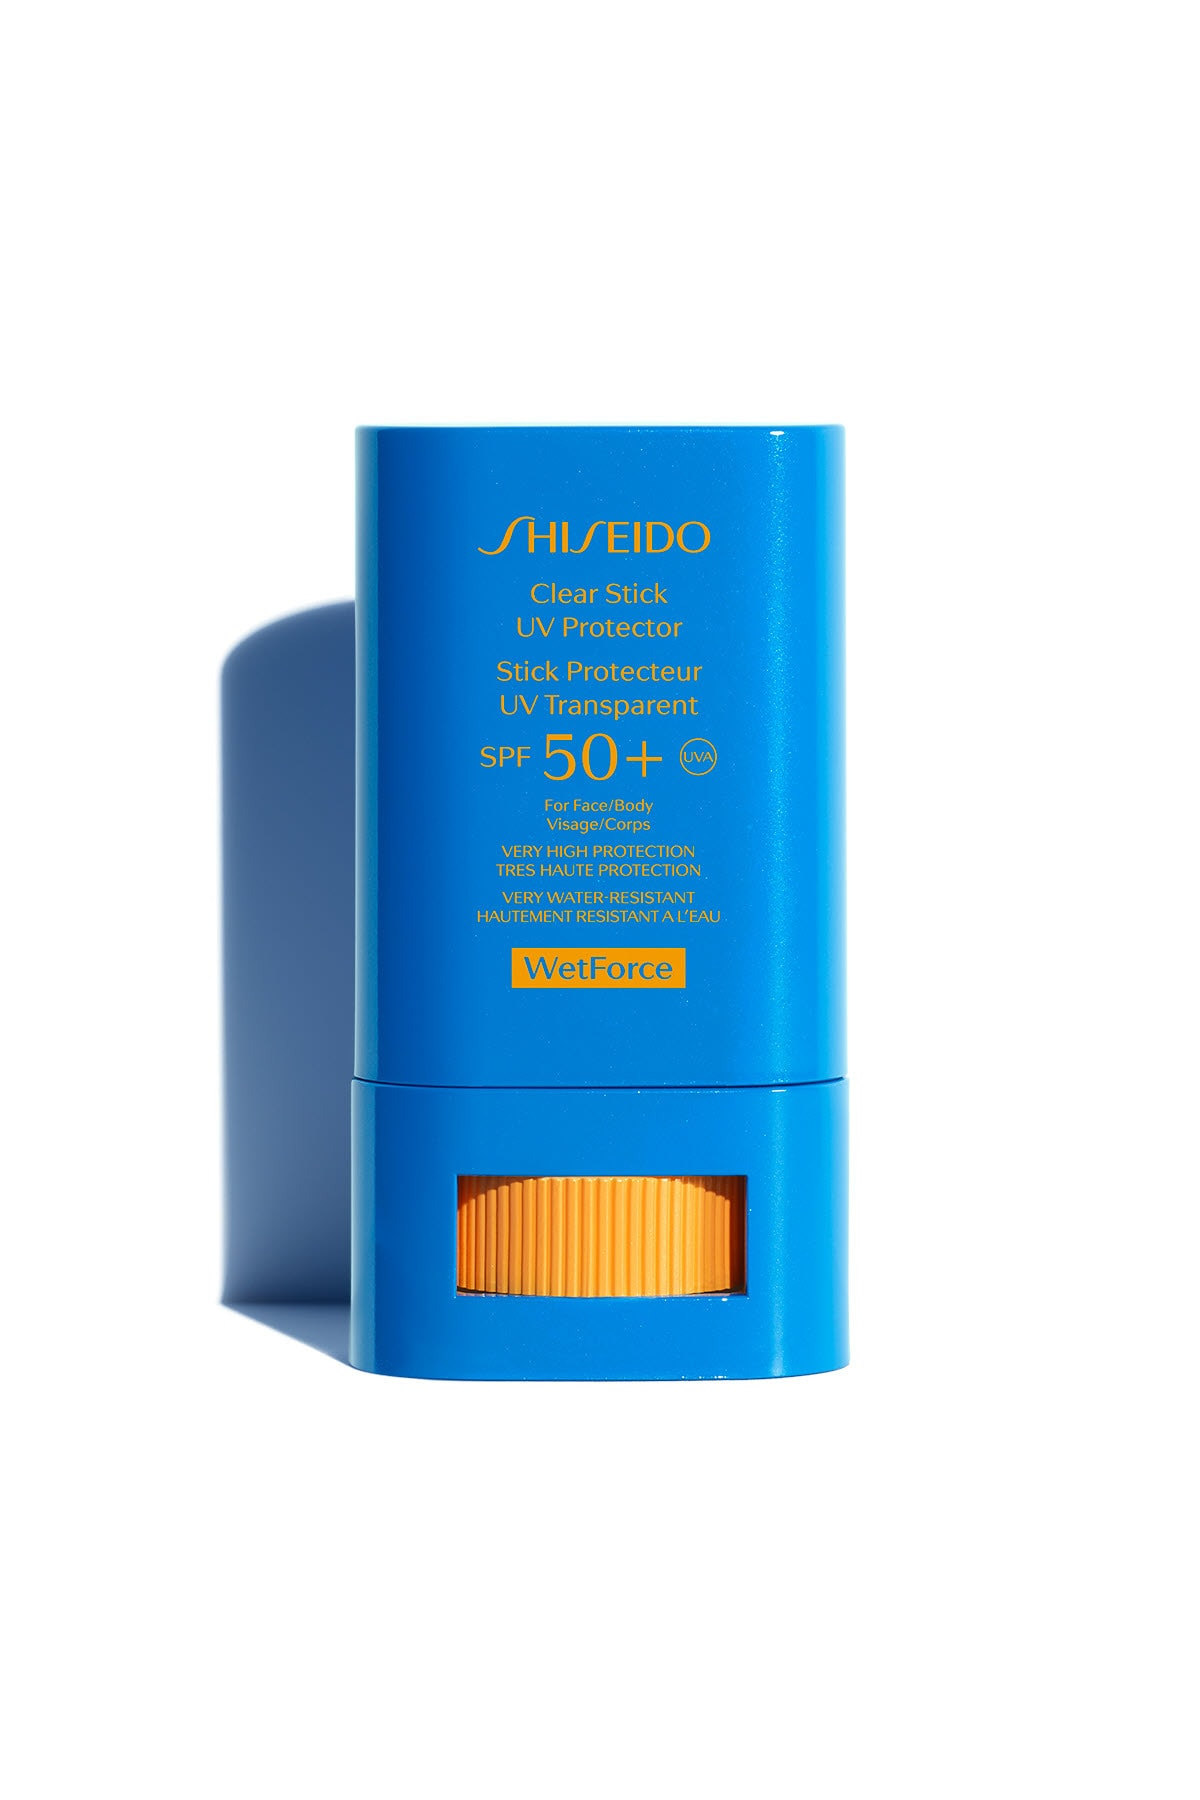 Shiseido Güneşe Karşı Koruyucu Şeffaf Stik SPF50 - GSC Clear Stick UV Protector SPF 50 729238145696 1